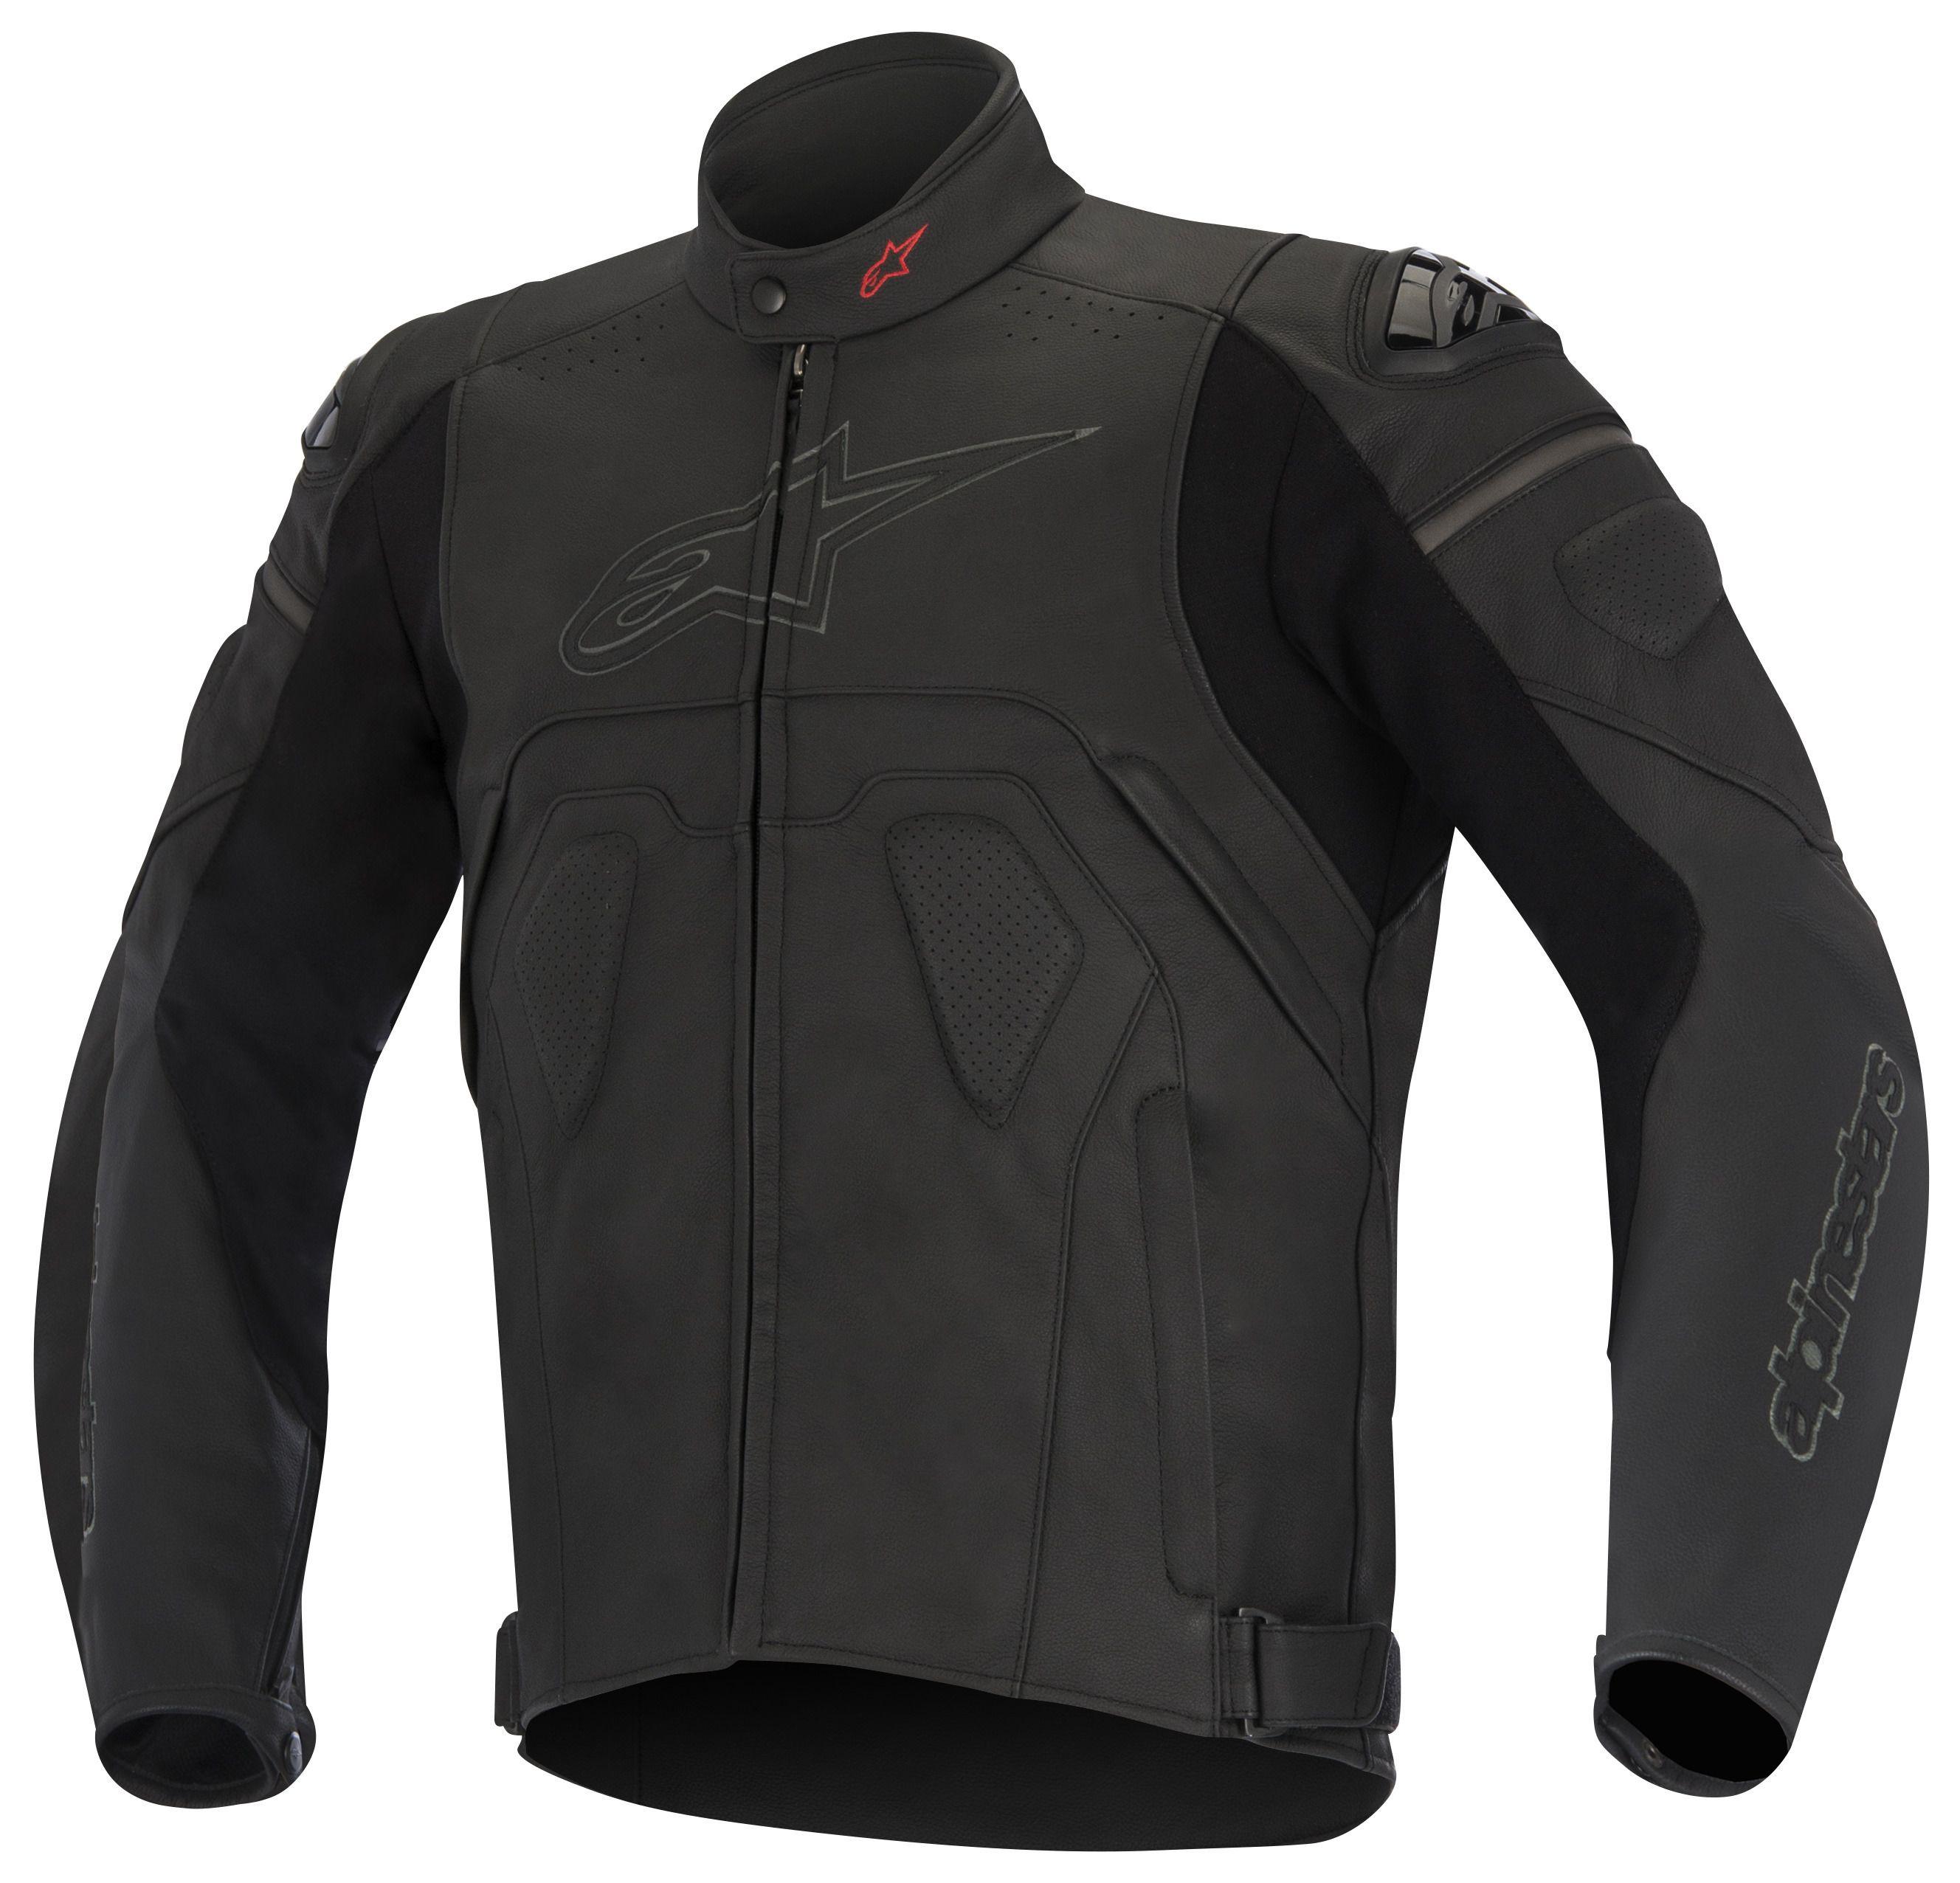 Alpinestars Core Jacket 15 88 49 Off Revzilla